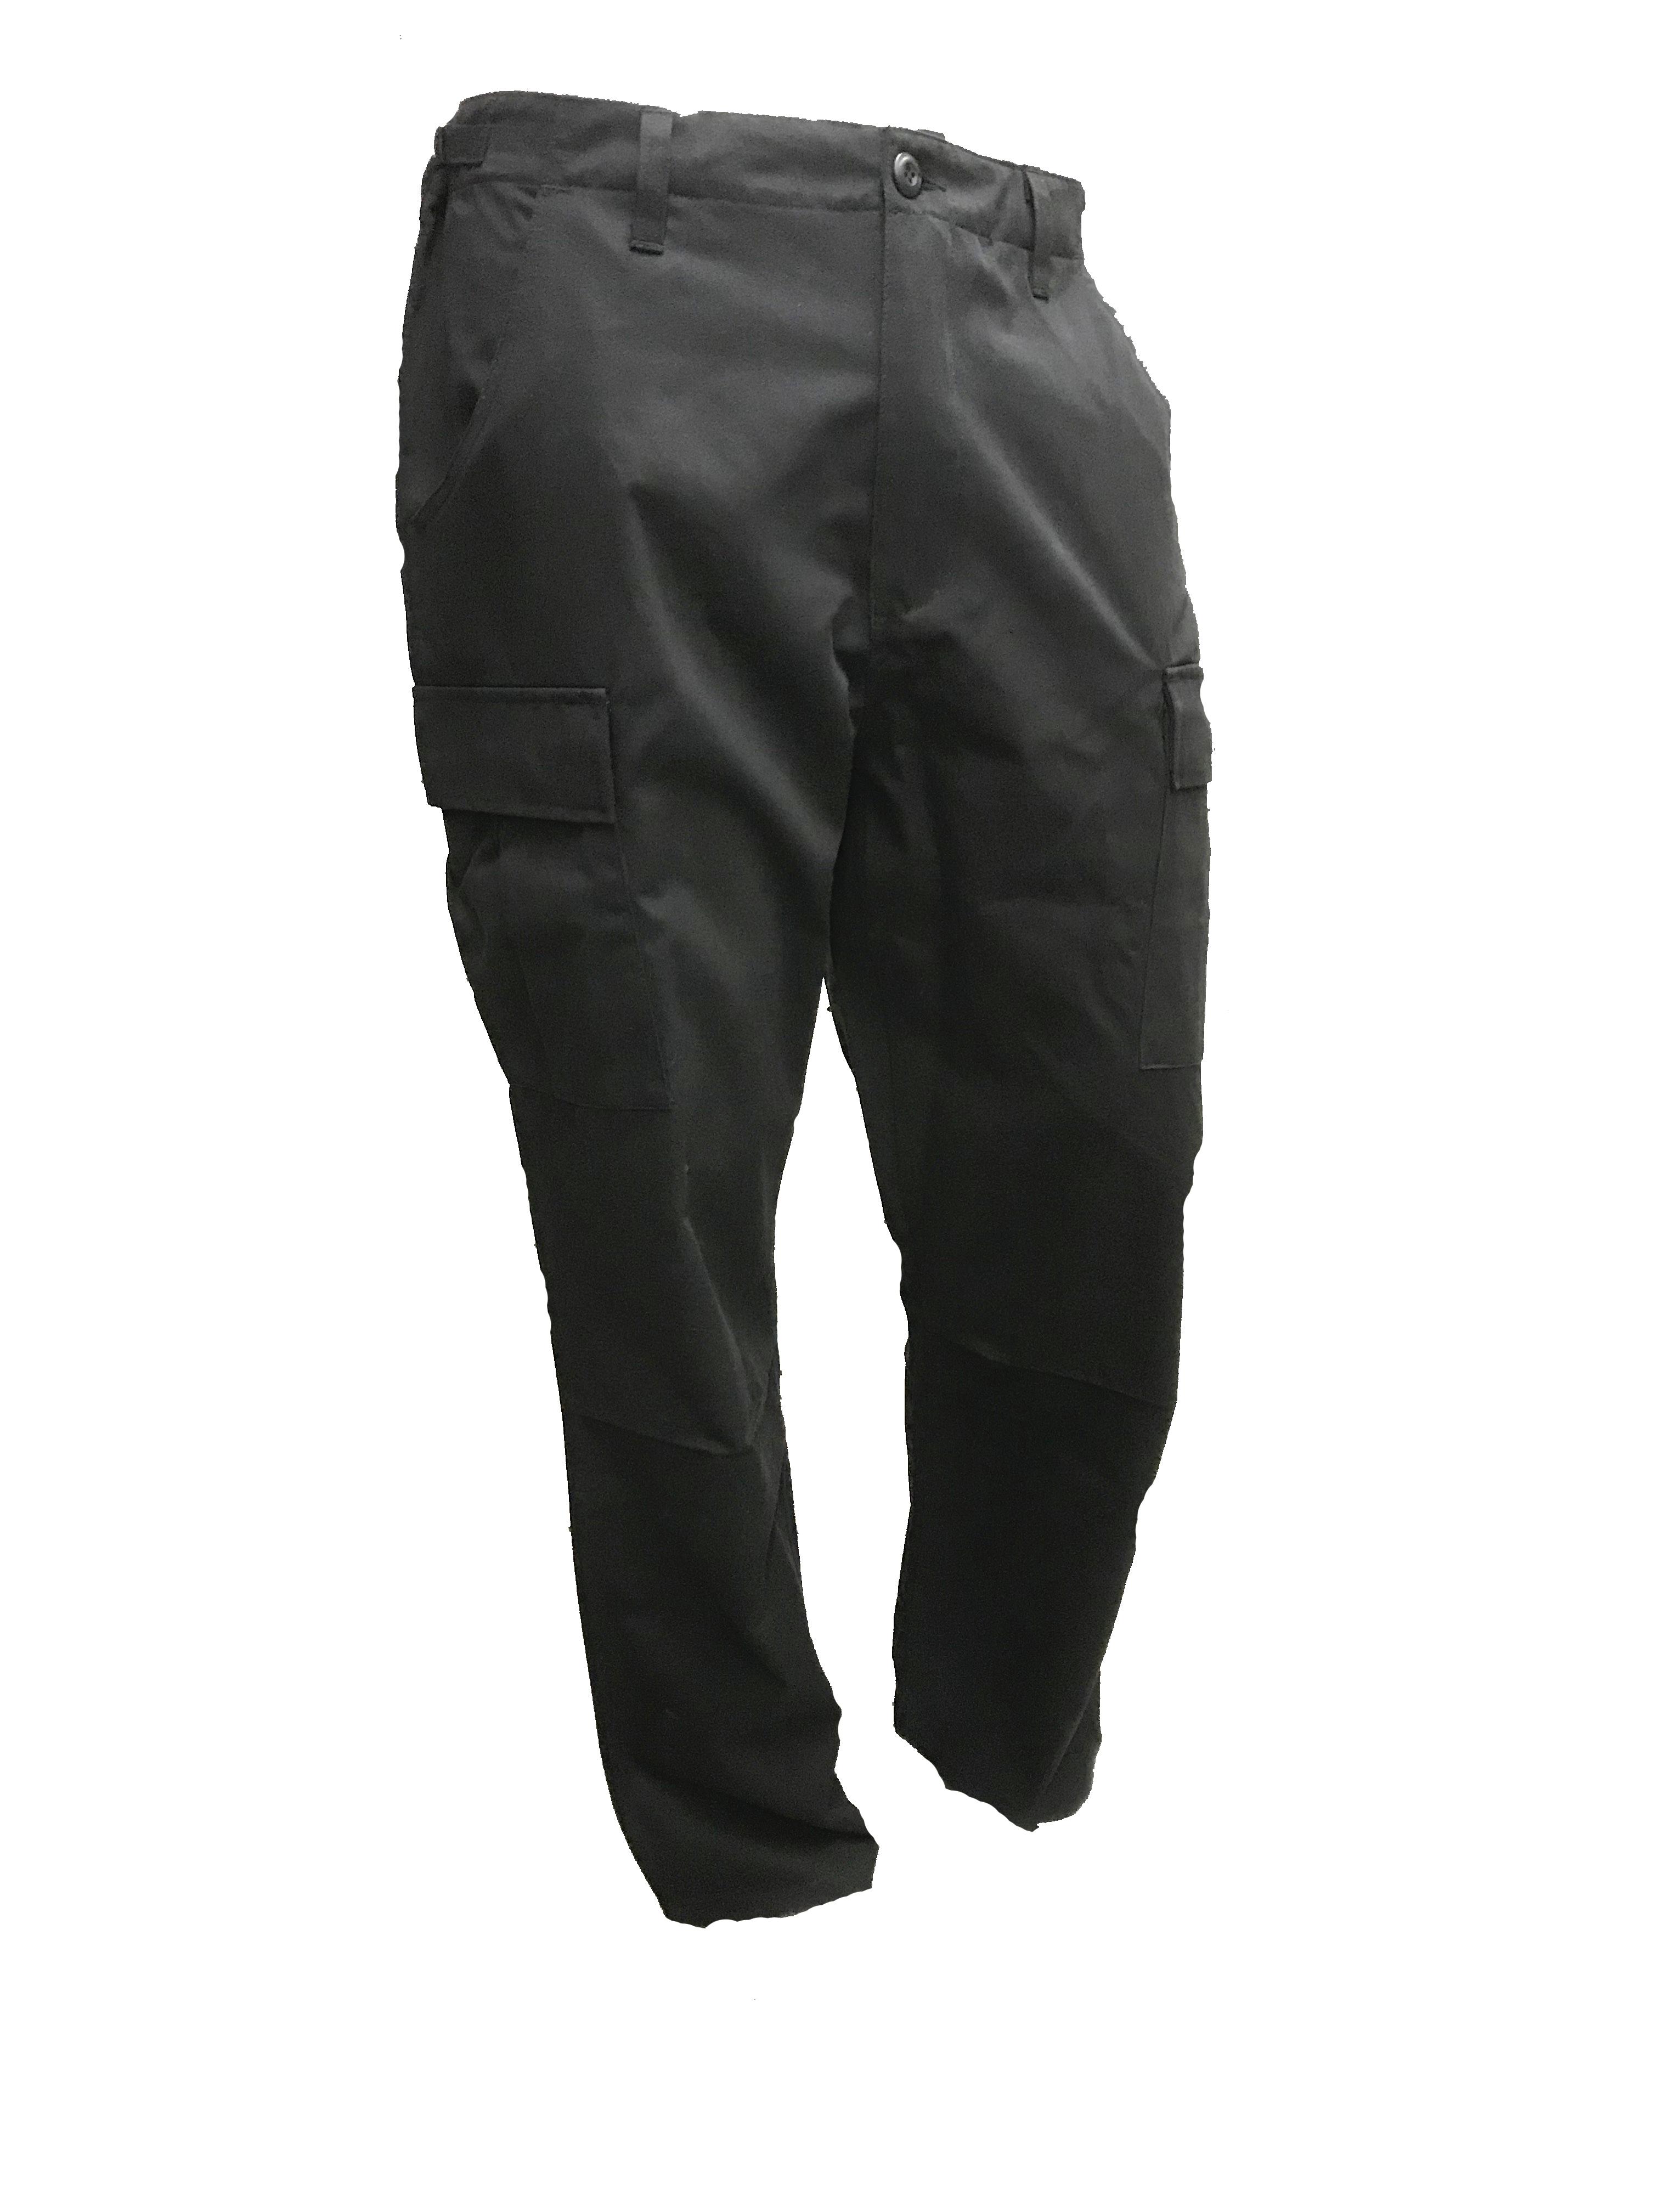 SGS Black cargo pant